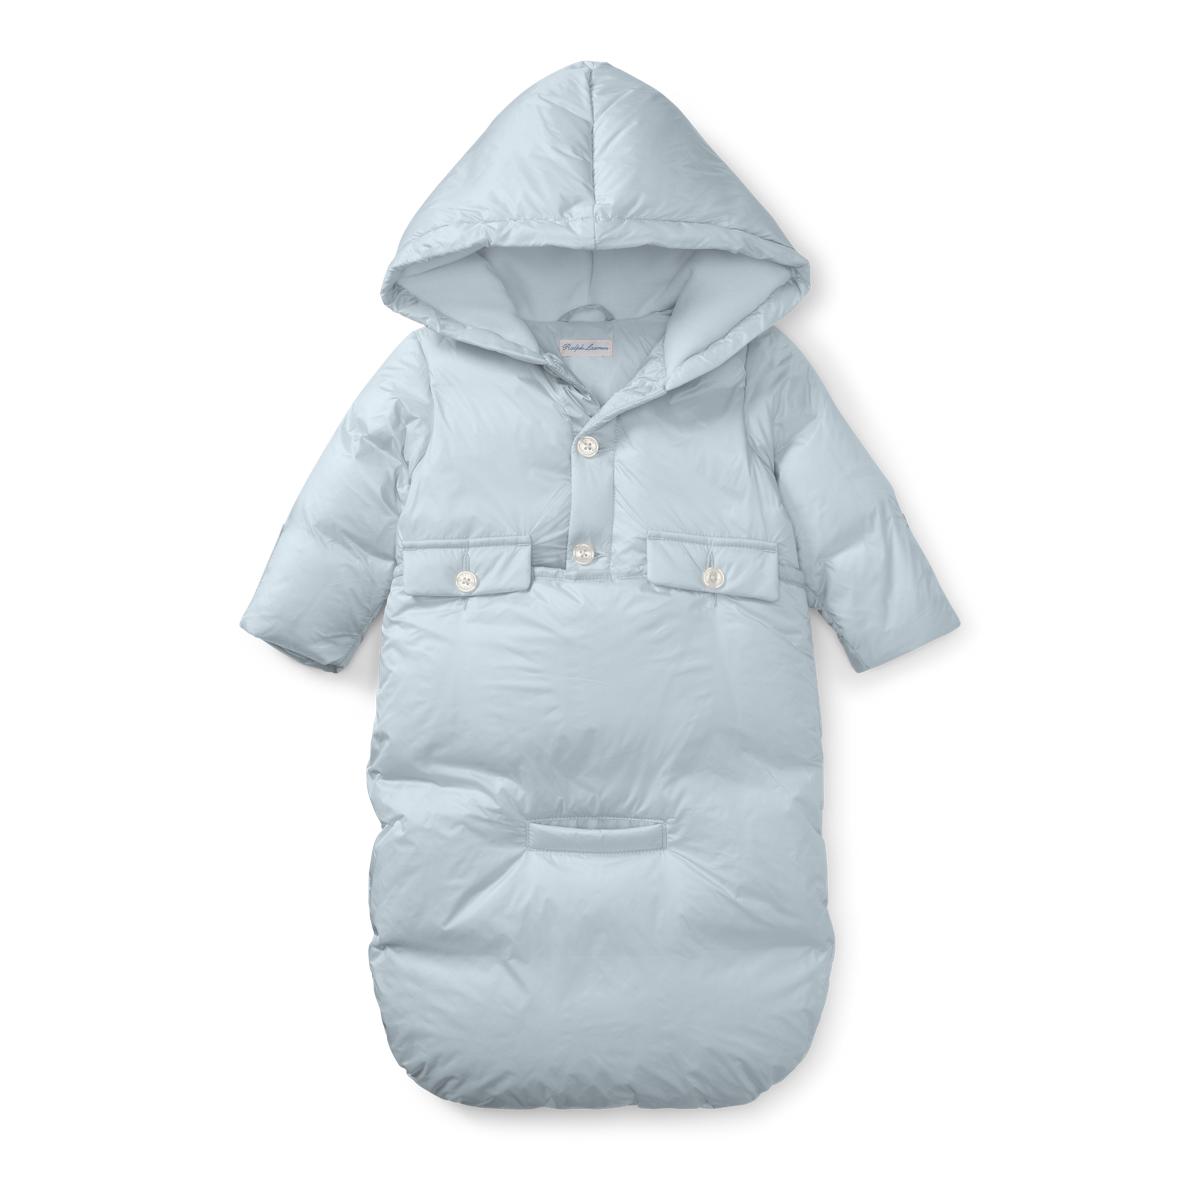 371669f4d3 Convertible Down Bunting | Outerwear & Jackets Baby | Ralph Lauren